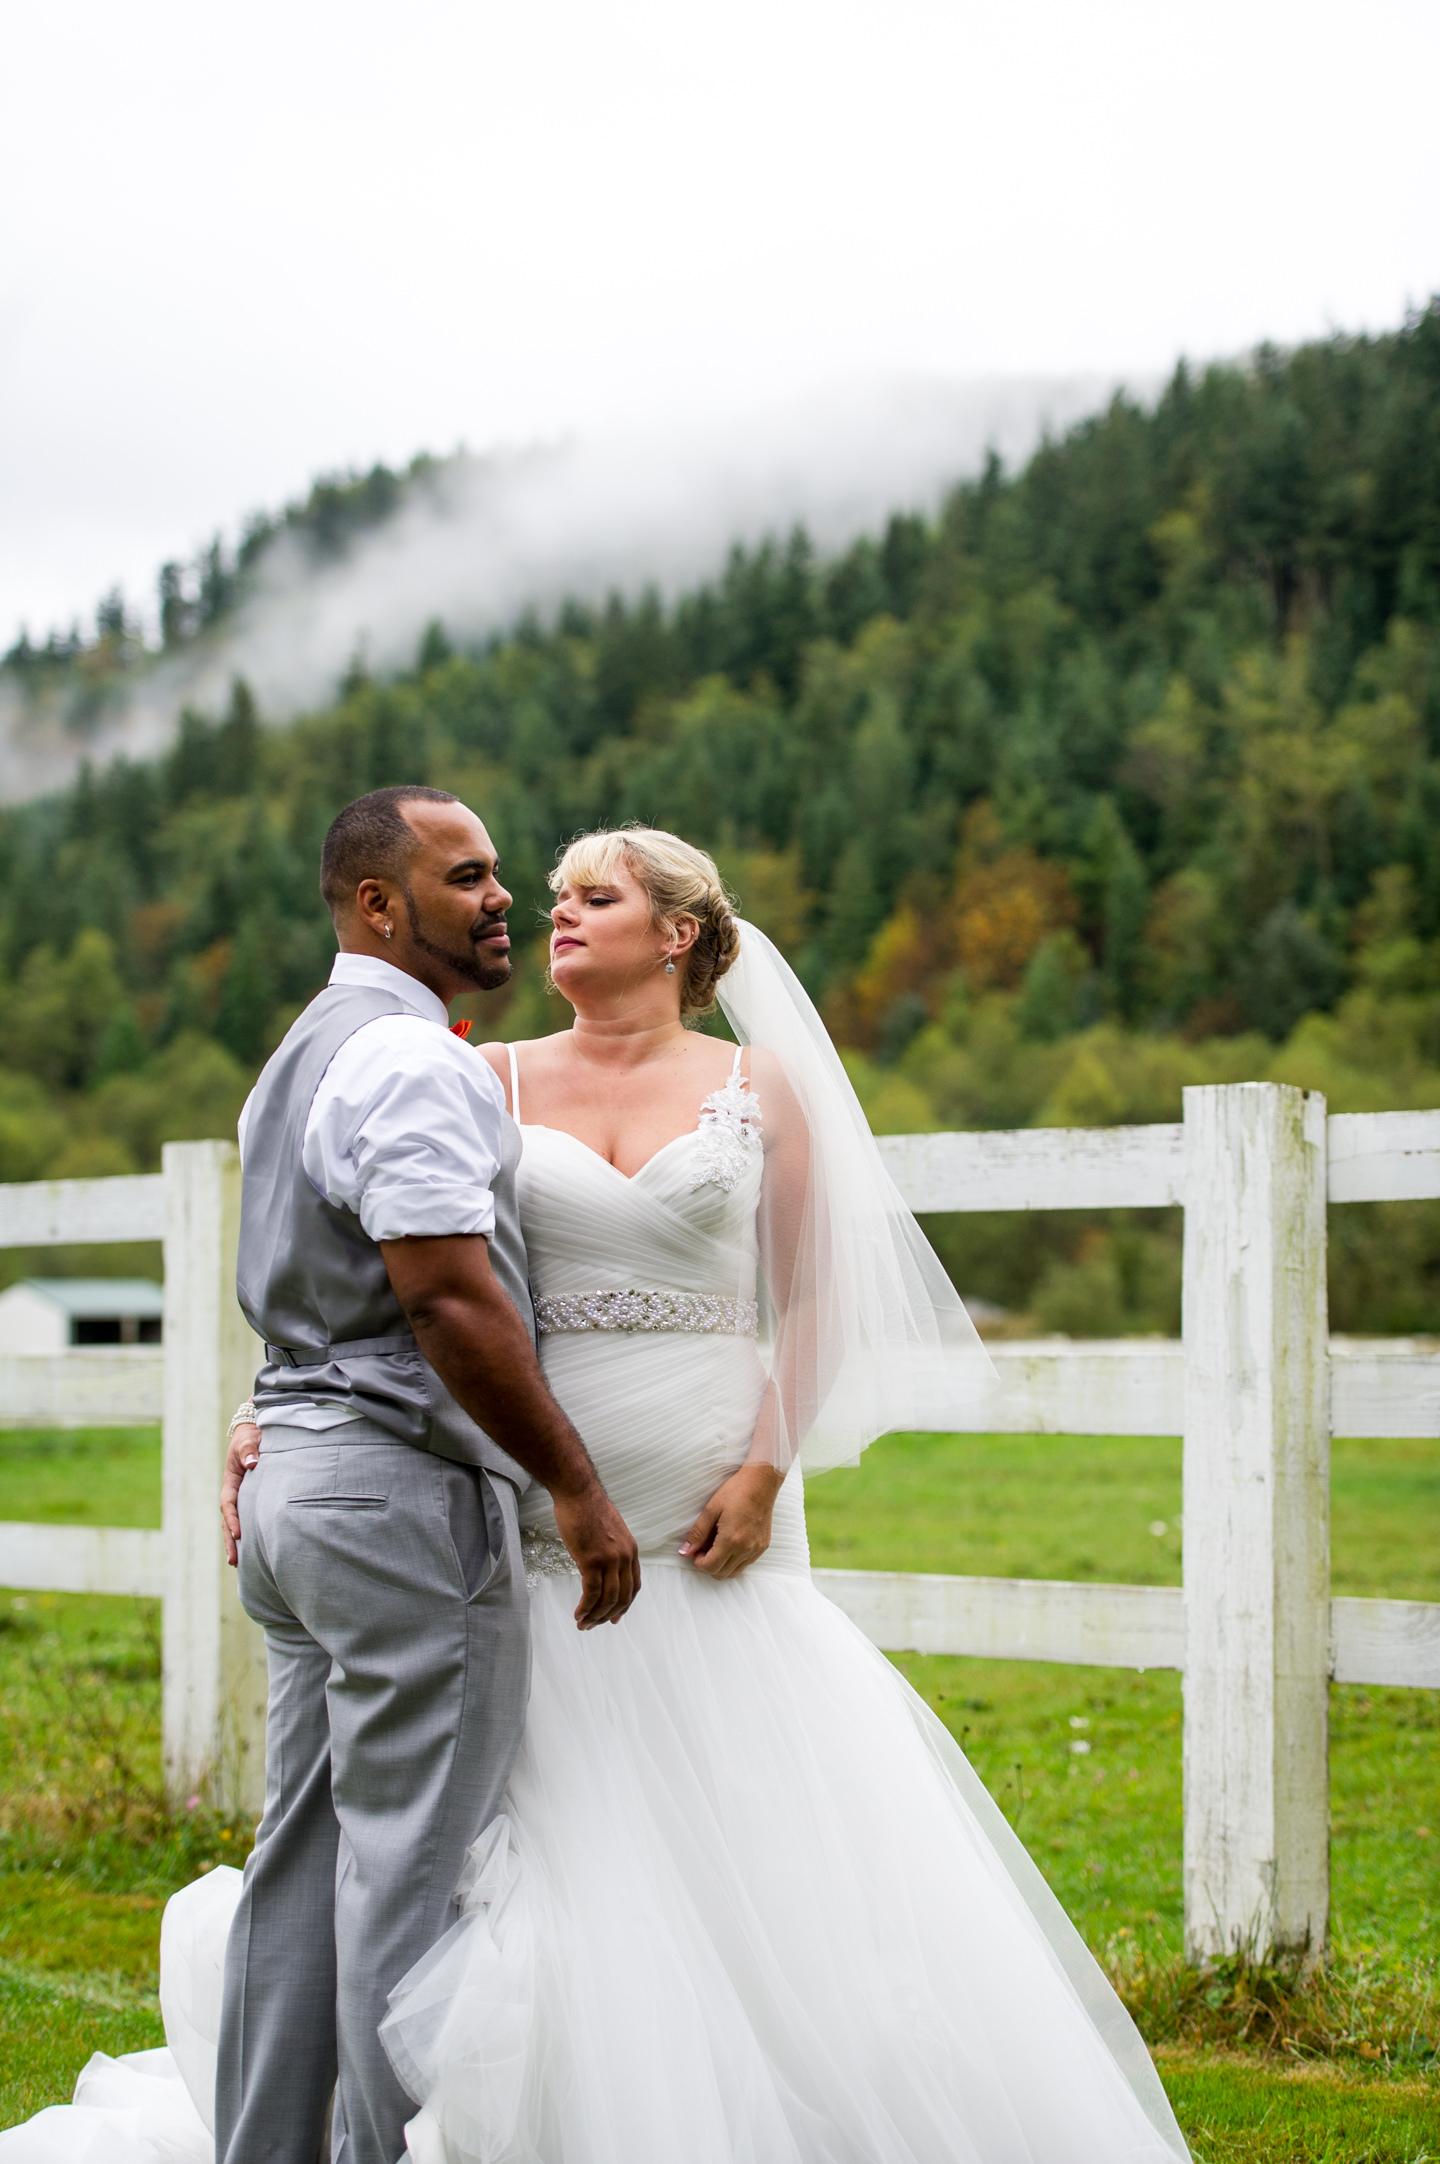 20160917_Tat_Renee and Marcus Wedding-28.jpg